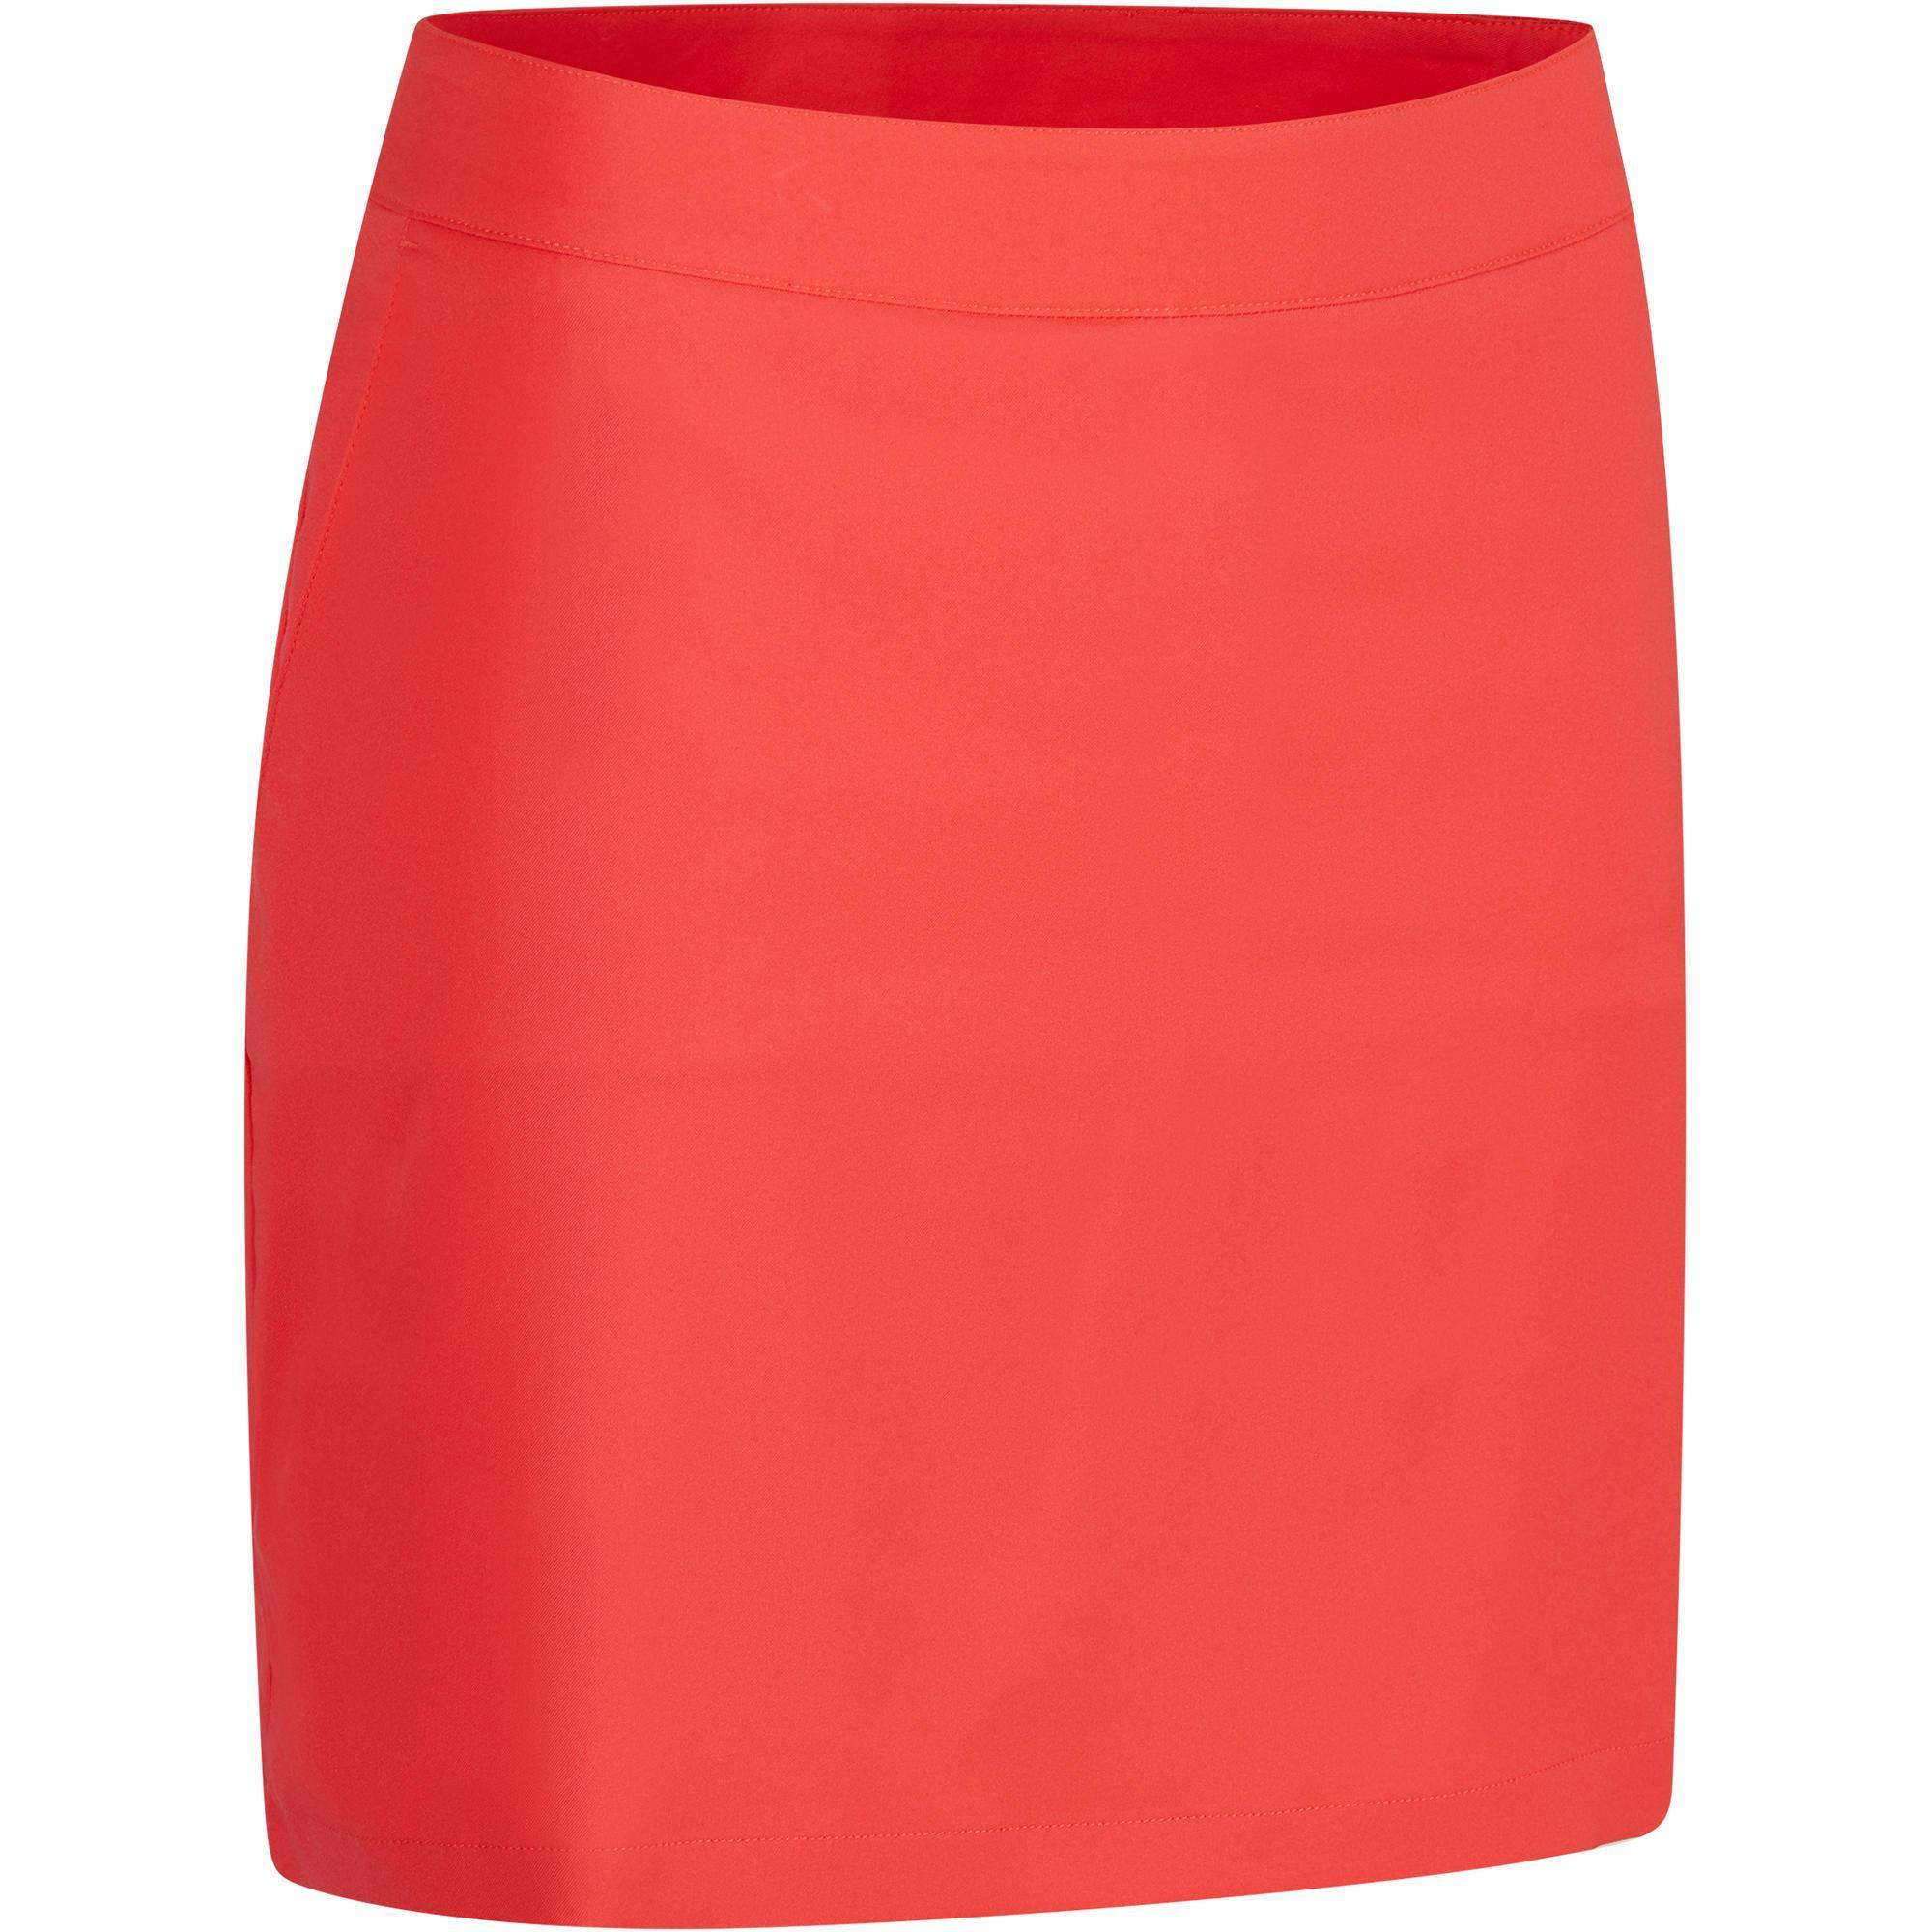 Inesis Golf shortrokje 900 voor dames, warm weer, rood